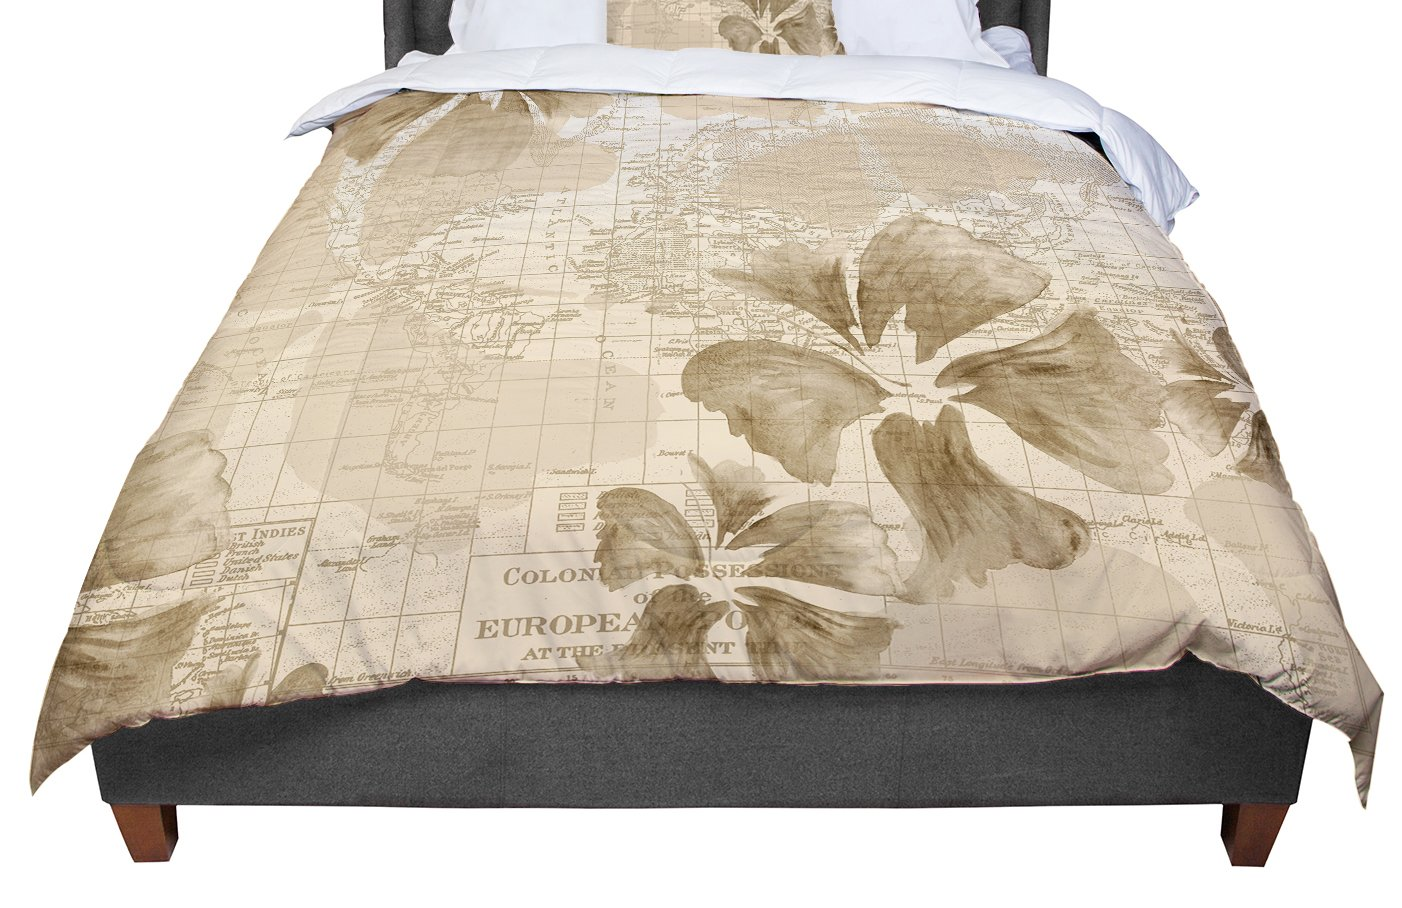 KESS InHouse Catherine Holcombe Flower Power Tan Brown Map King Cal King Comforter 104 X 88